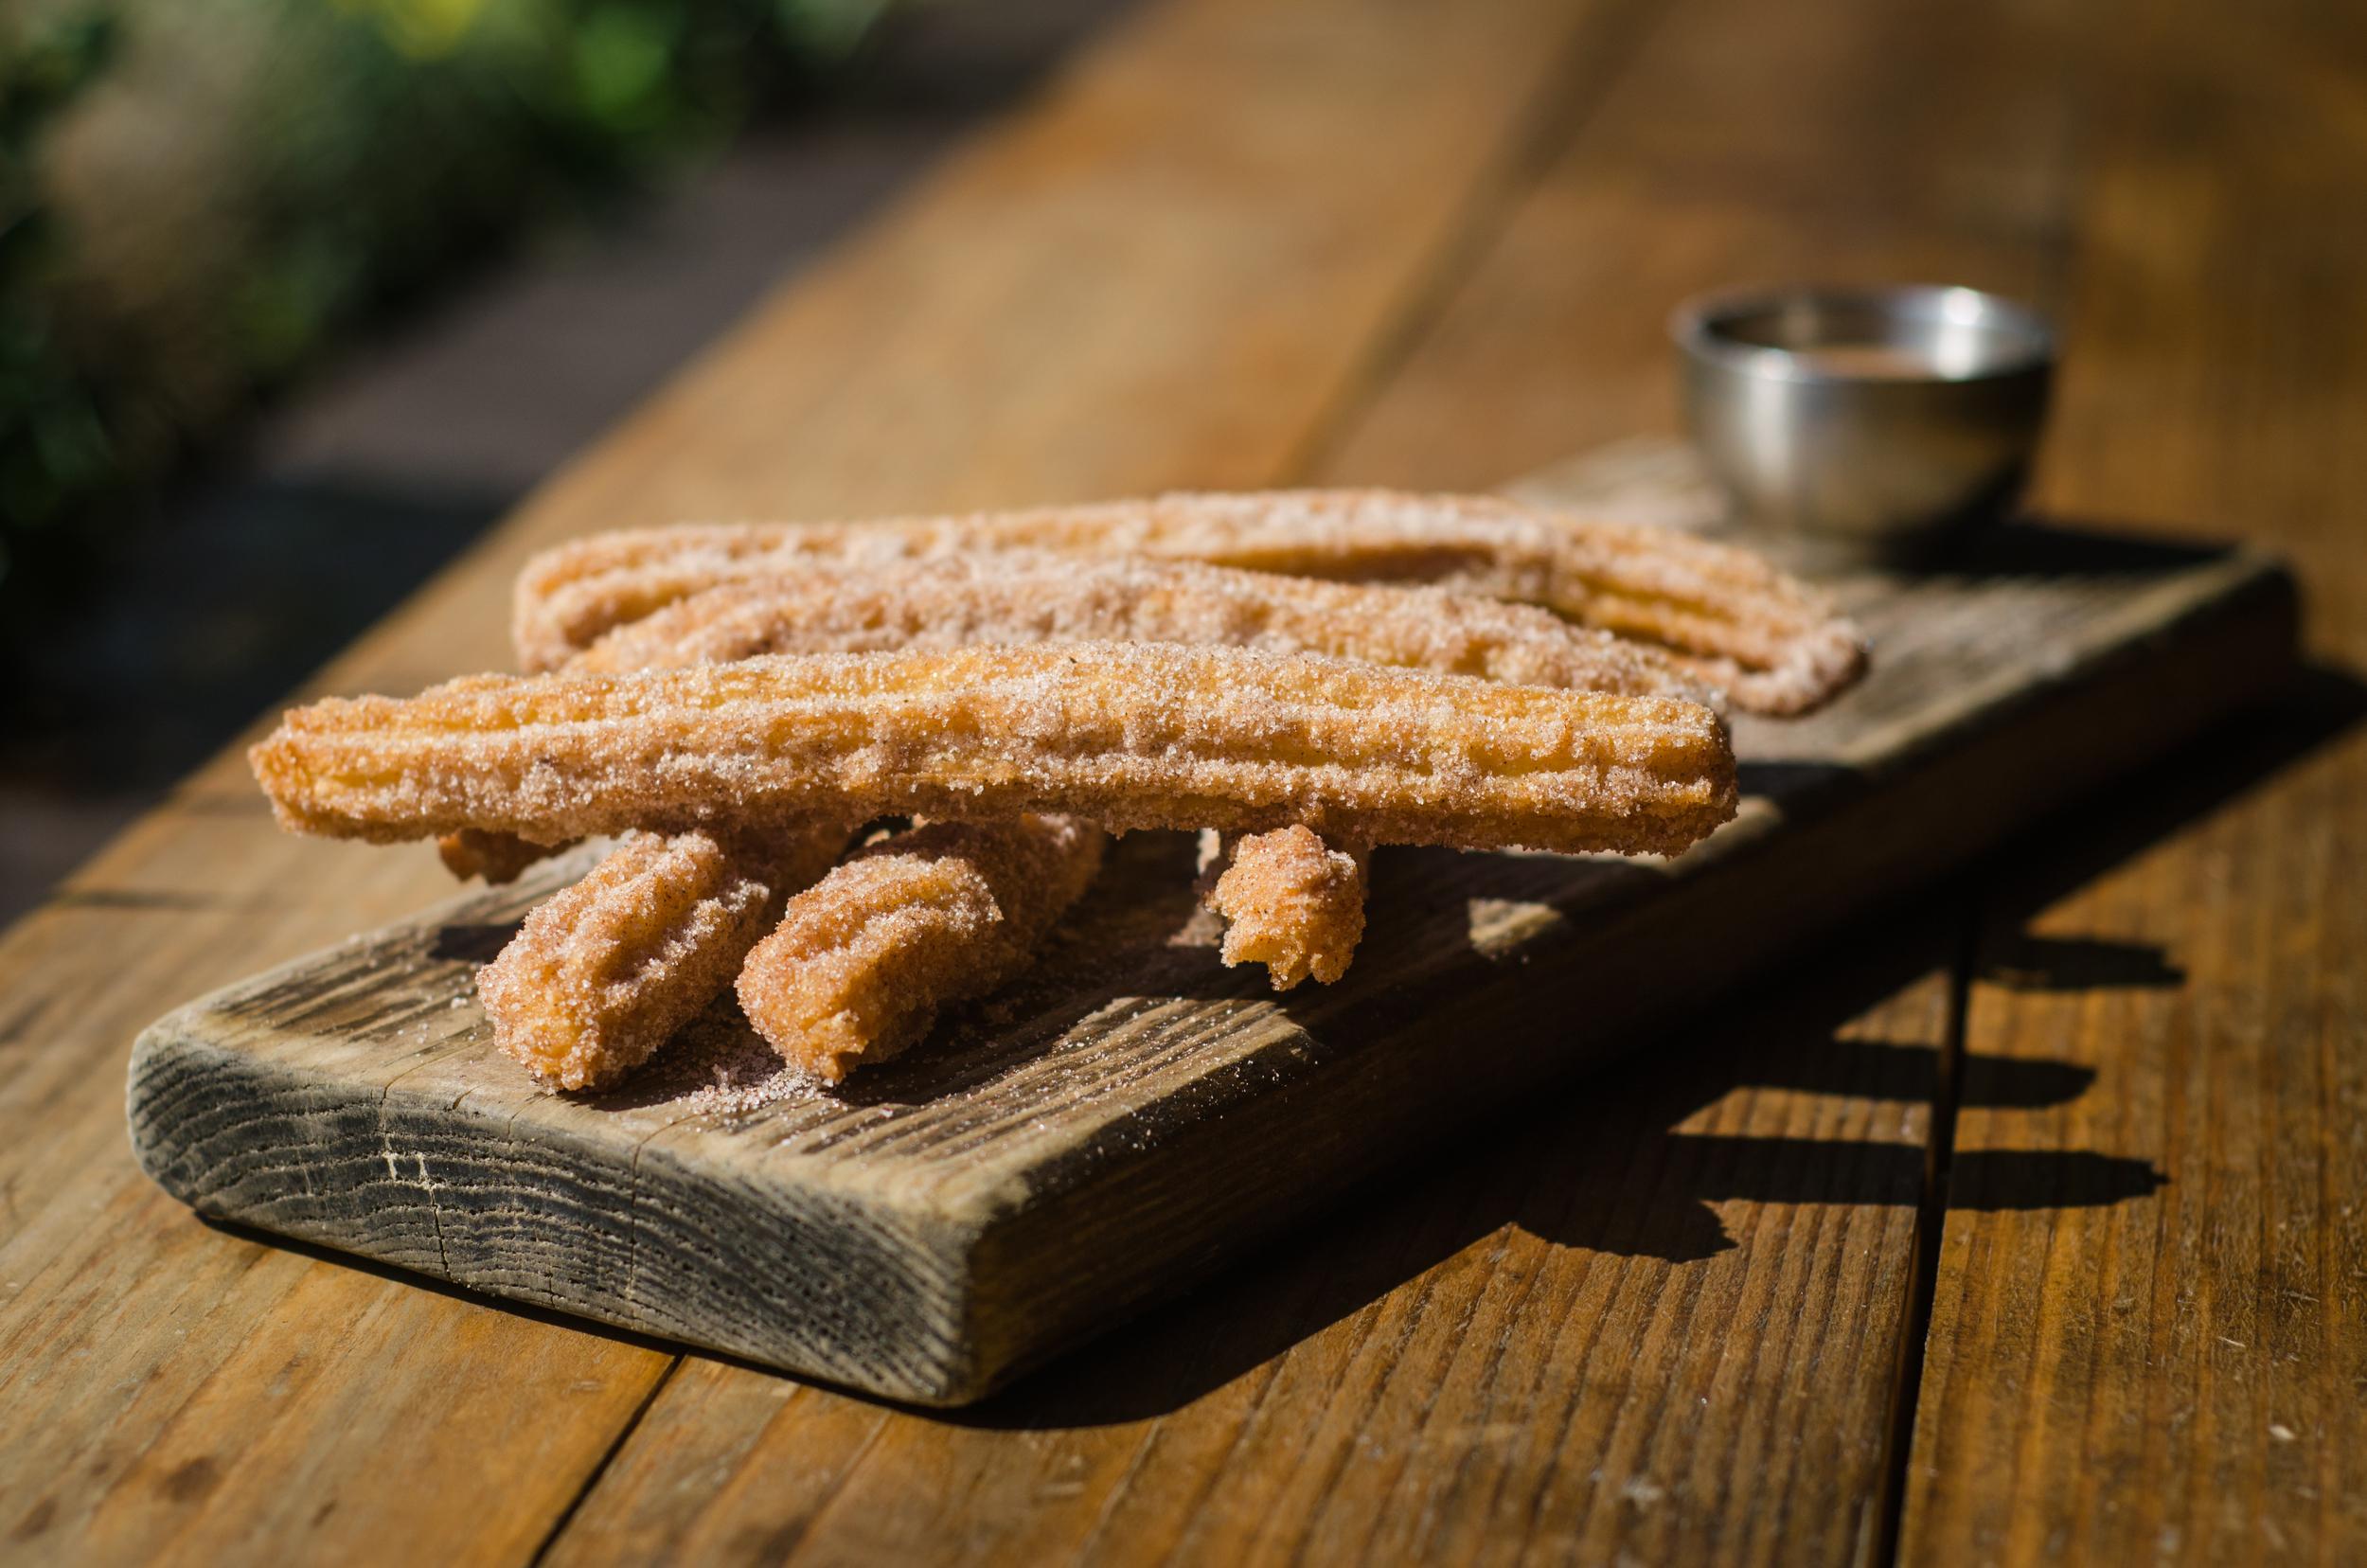 Saint Añejo 's churros with cinnamon sugar and dulche de leche sauce for dipping